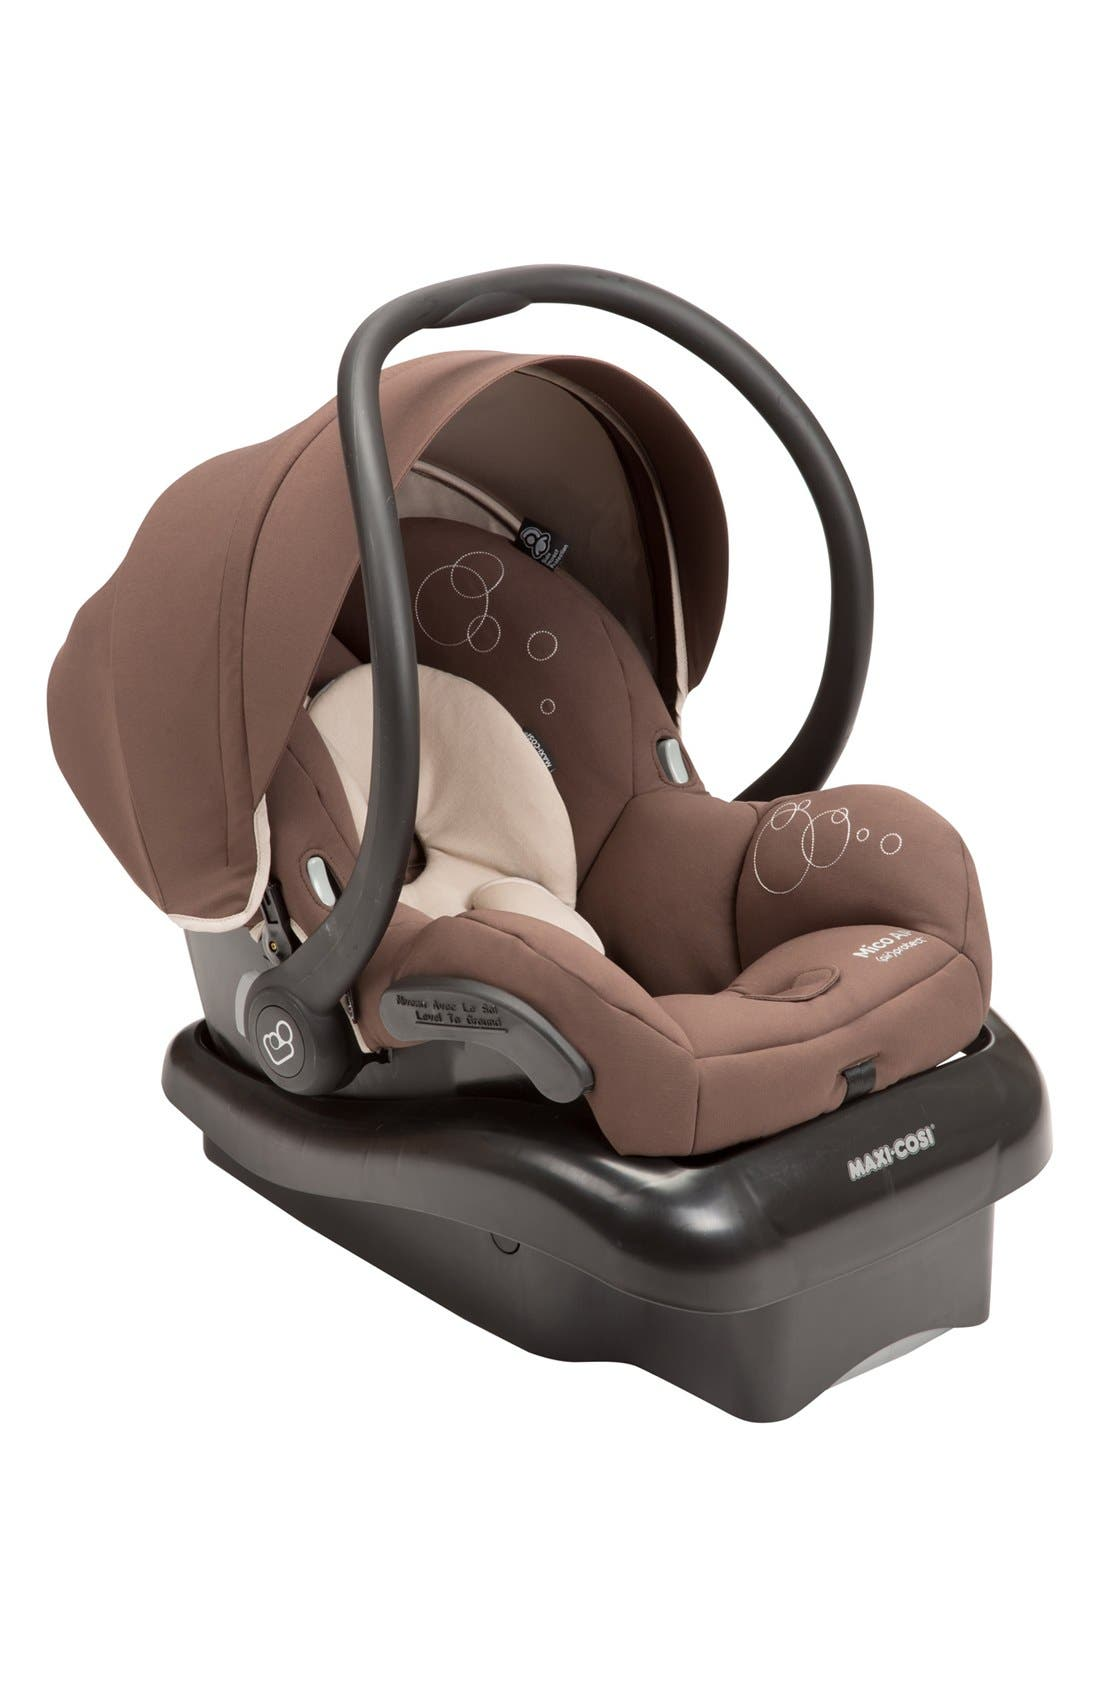 Infant MaxiCosi Mico Ap Infant Car Seat  Base Size One Size  Brown